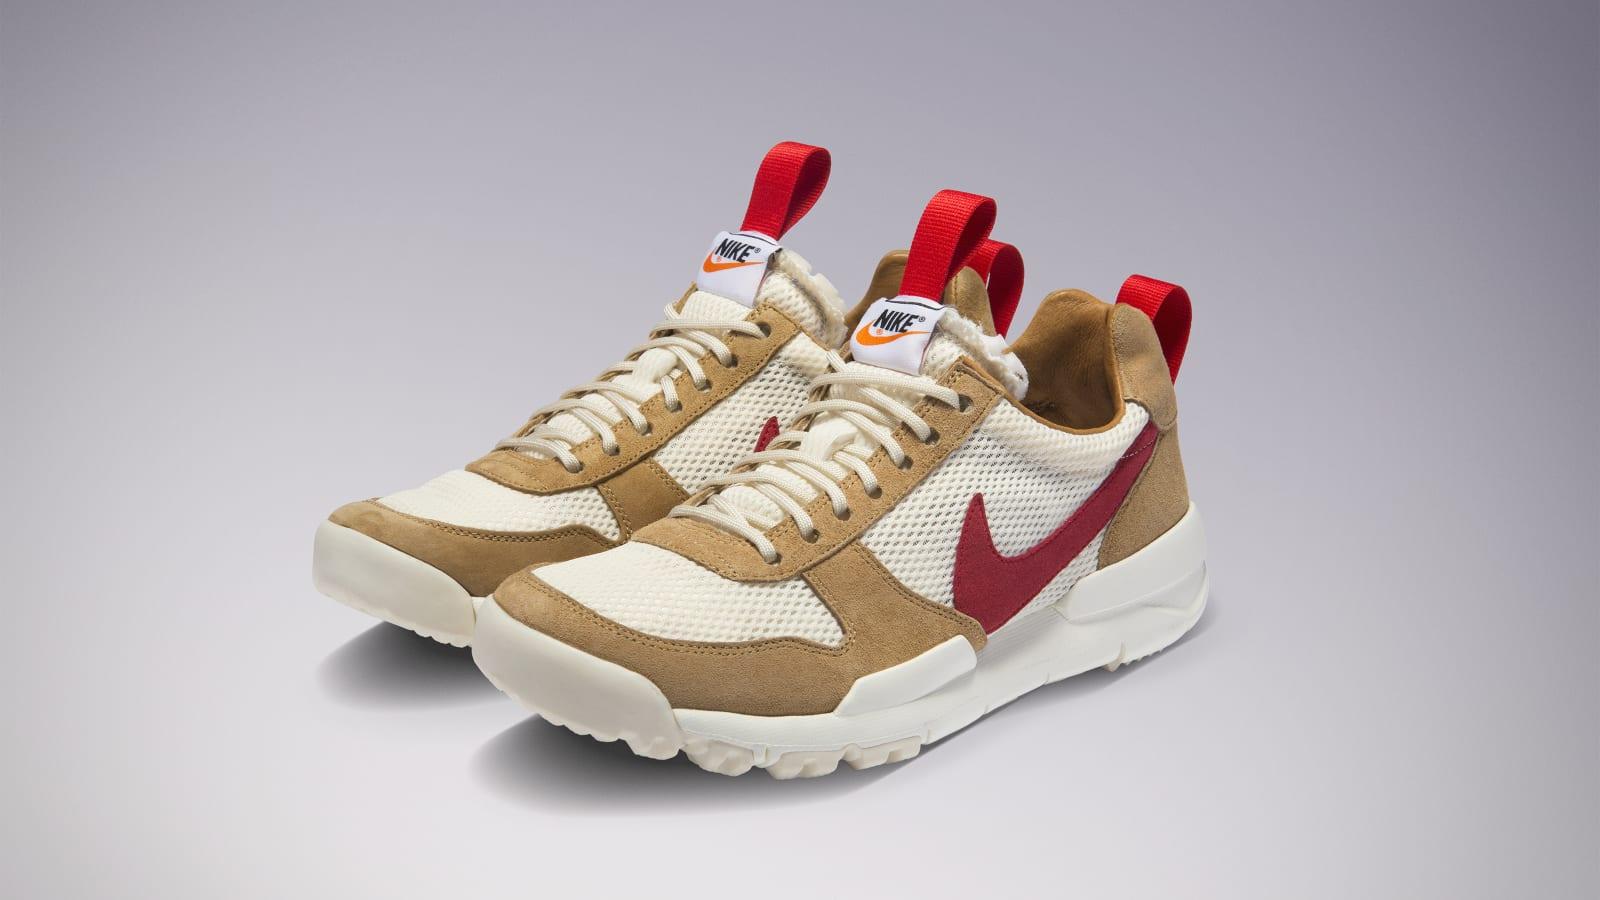 Tom Sachs x Nike Mars Yard 2.0 Angled